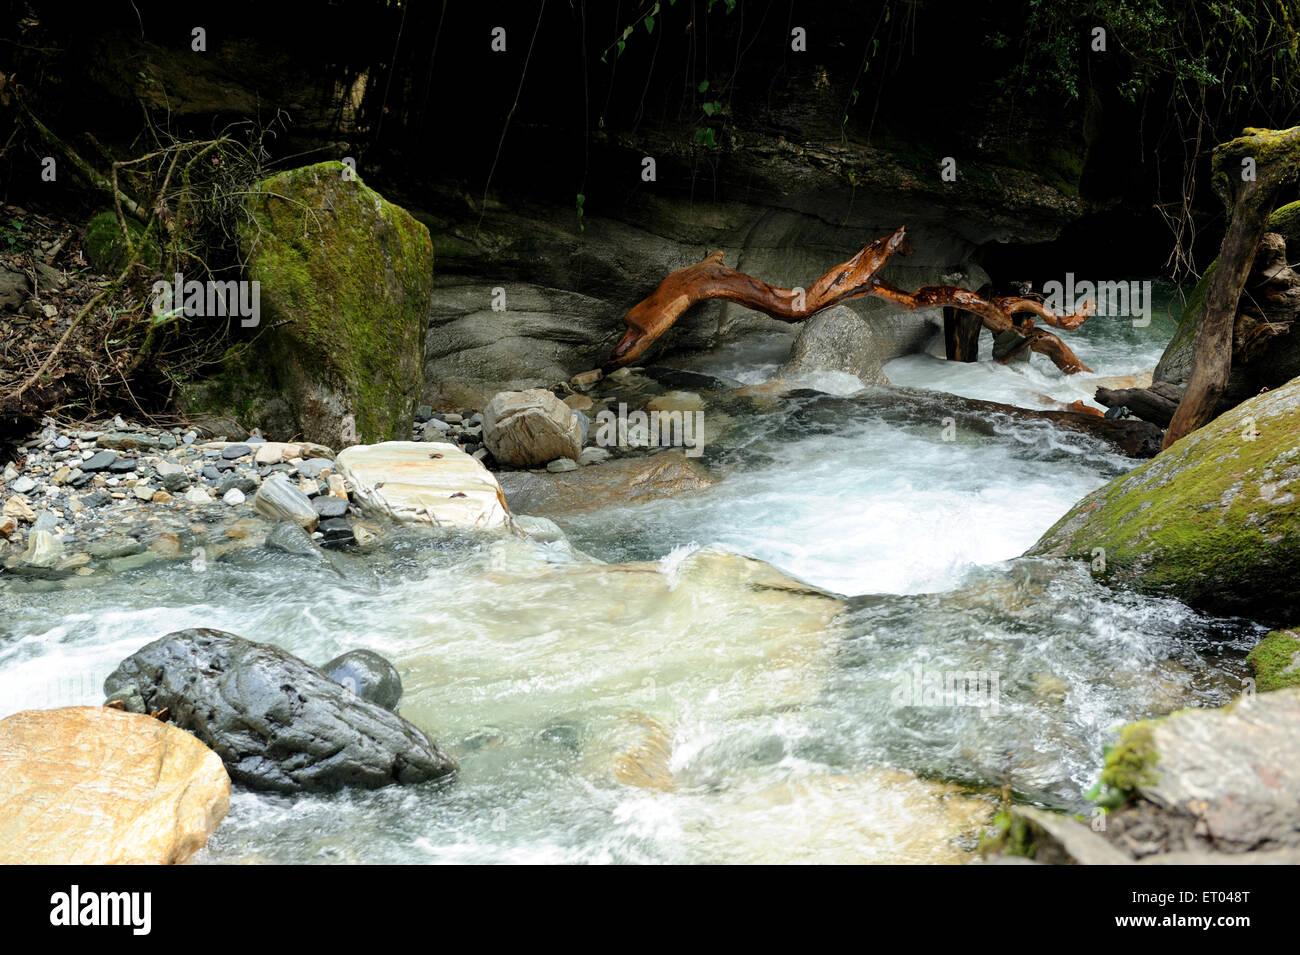 Stream with trunk ; Ghoripani ; Nepal - Stock Image